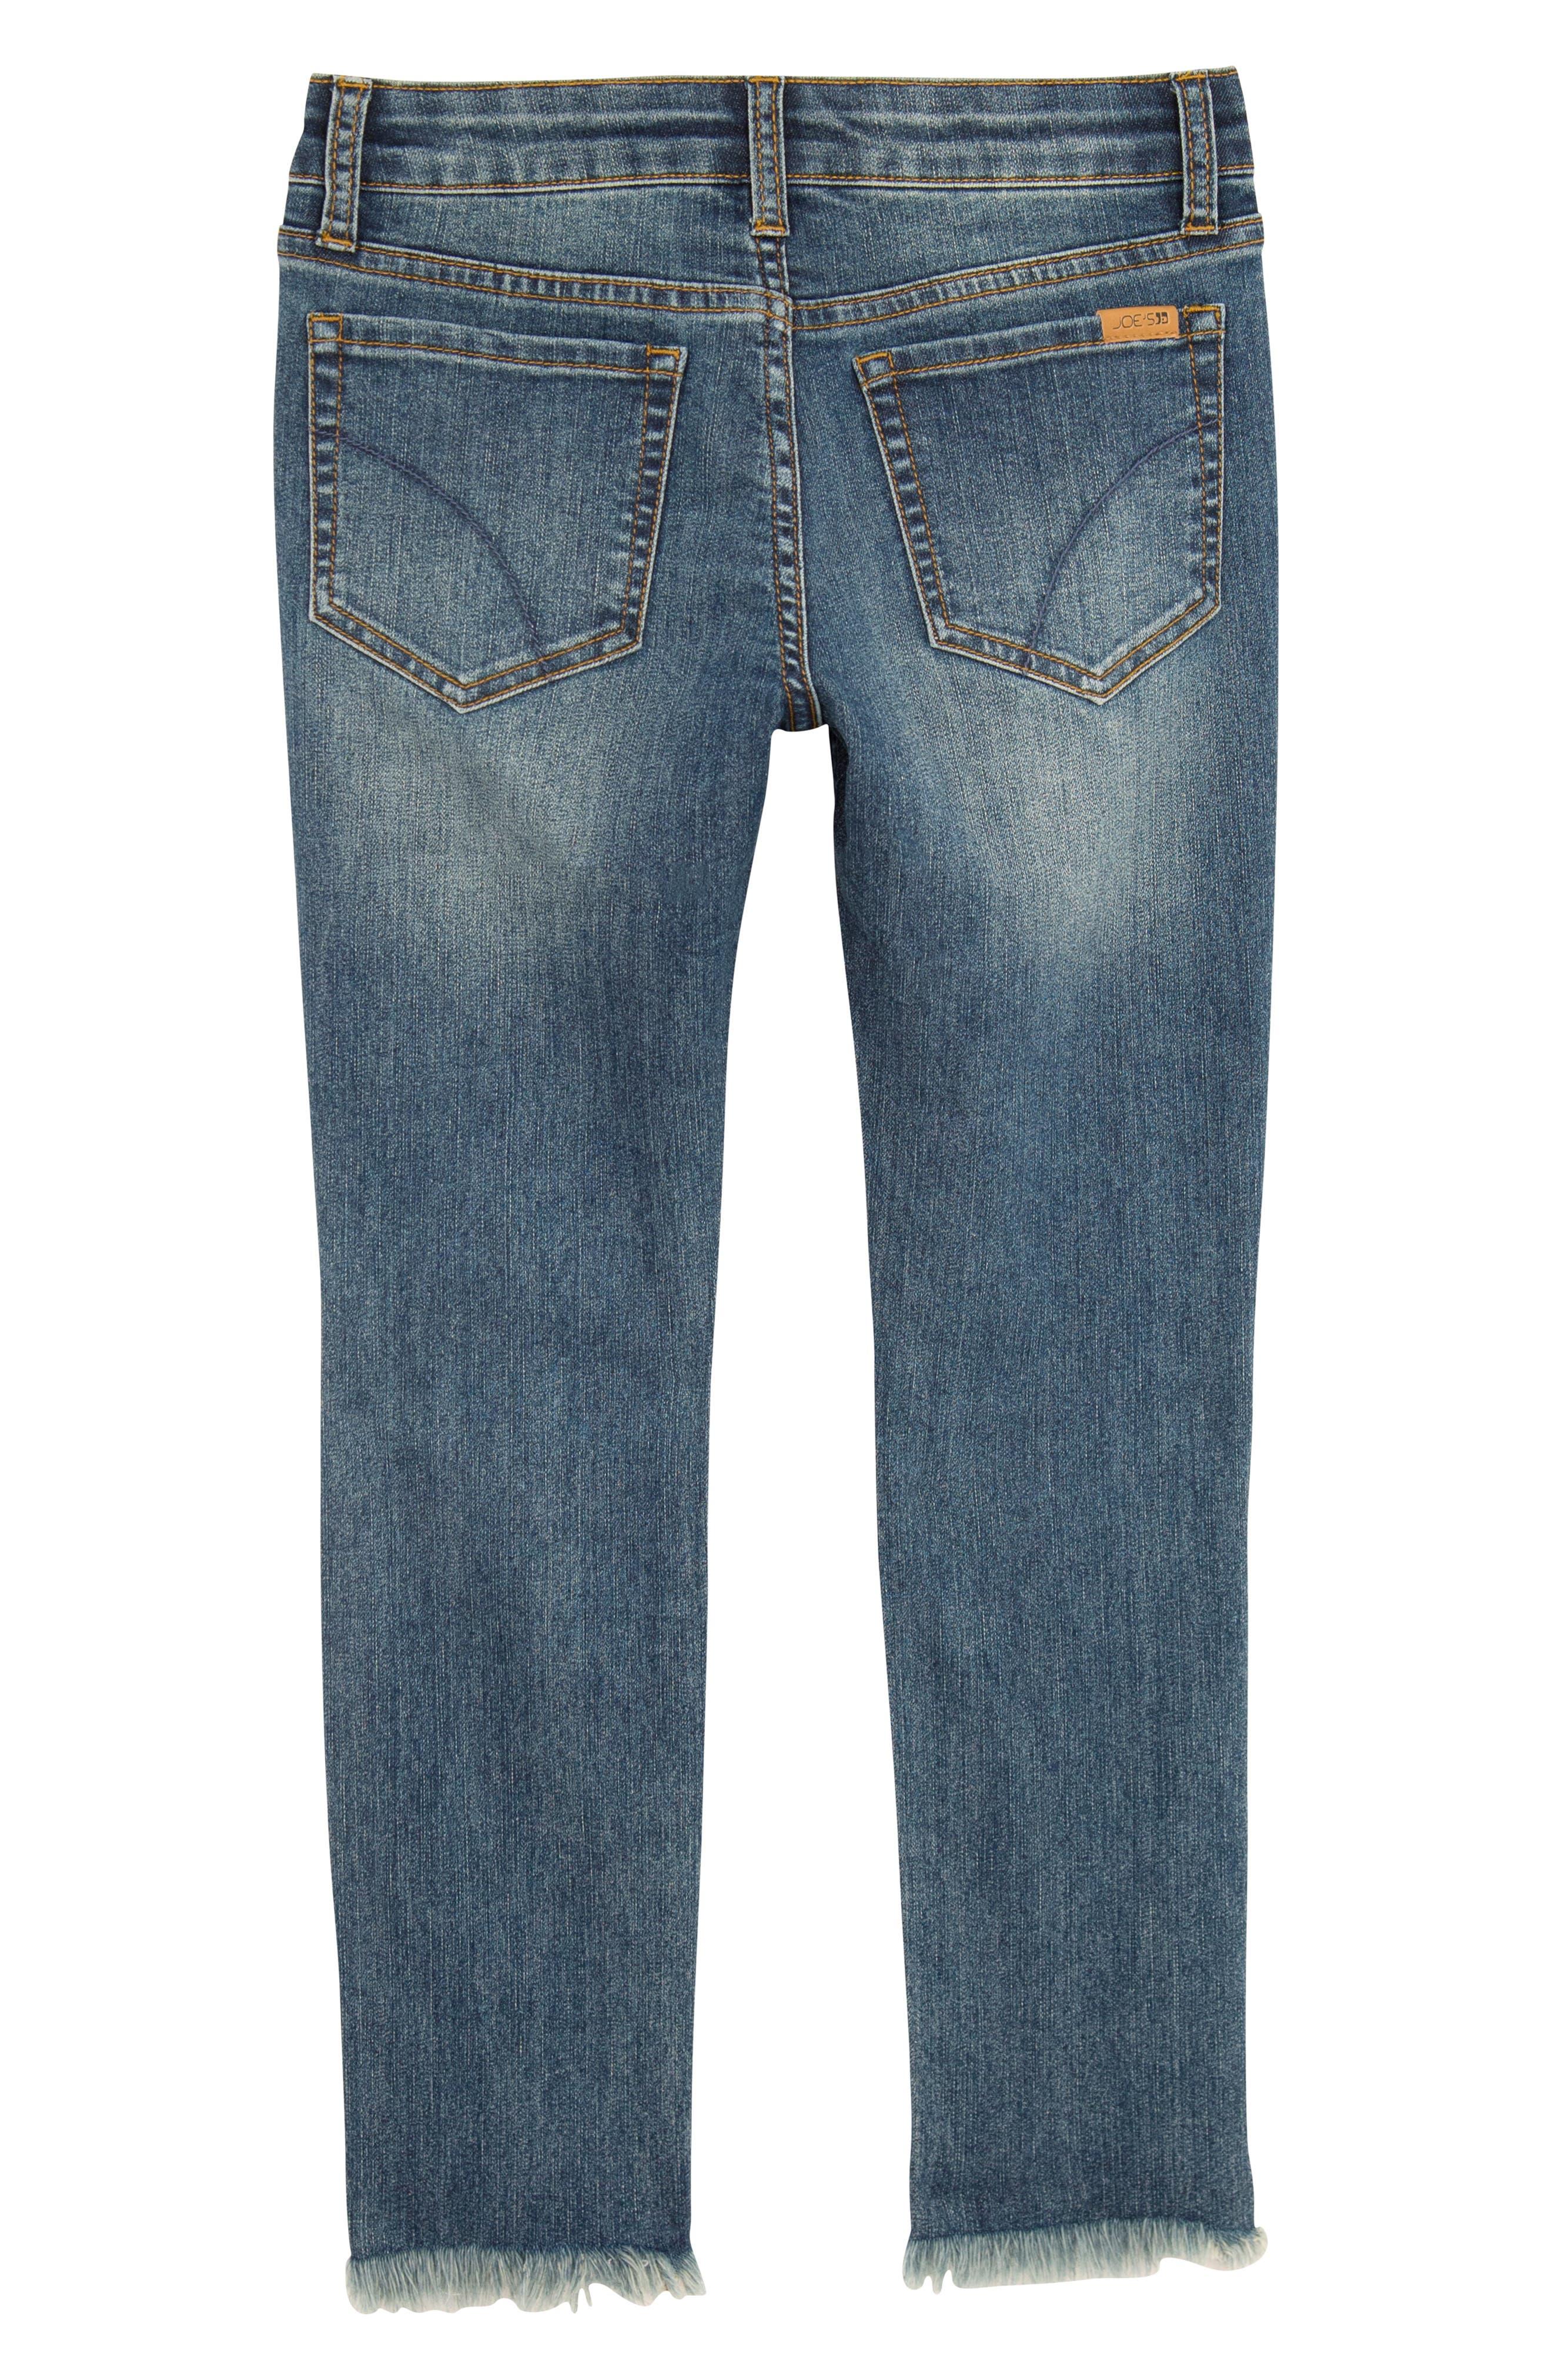 The Markie Angled Fray Skinny Jeans,                             Alternate thumbnail 2, color,                             MEDIUM VINTAGE